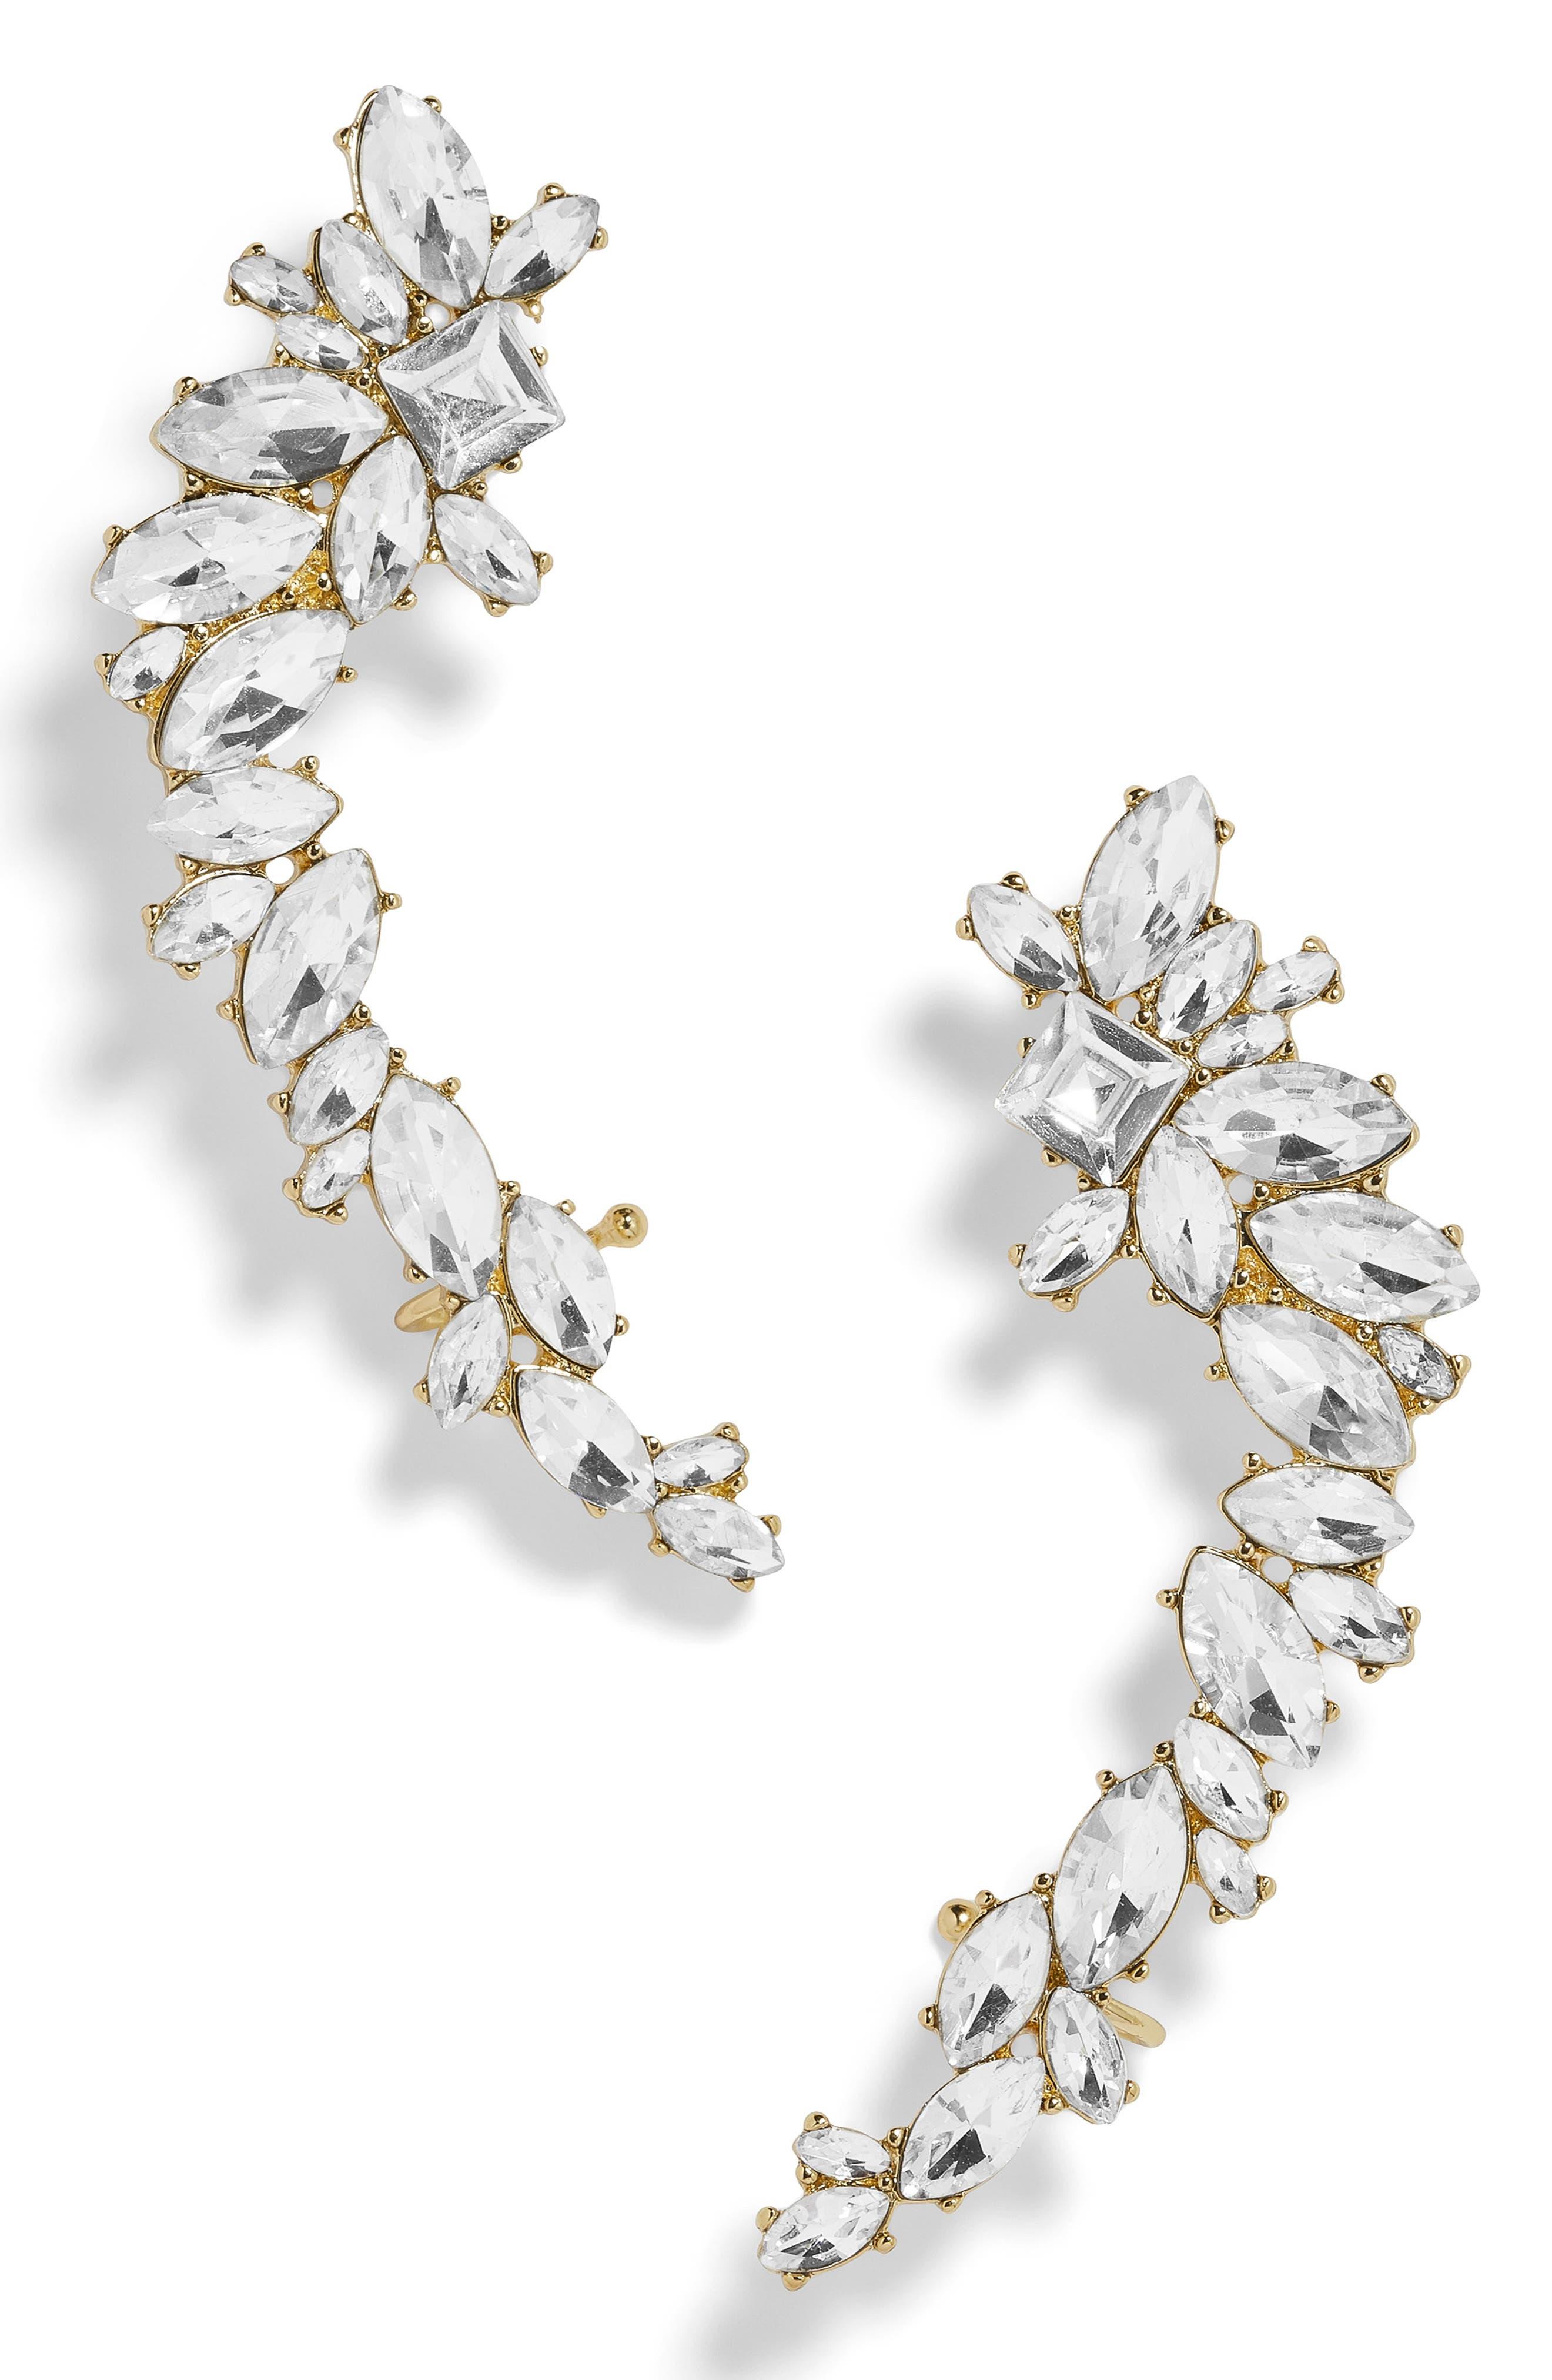 BAUBLEBAR, Eliza Large Crystal Crawler Earrings, Main thumbnail 1, color, GOLD